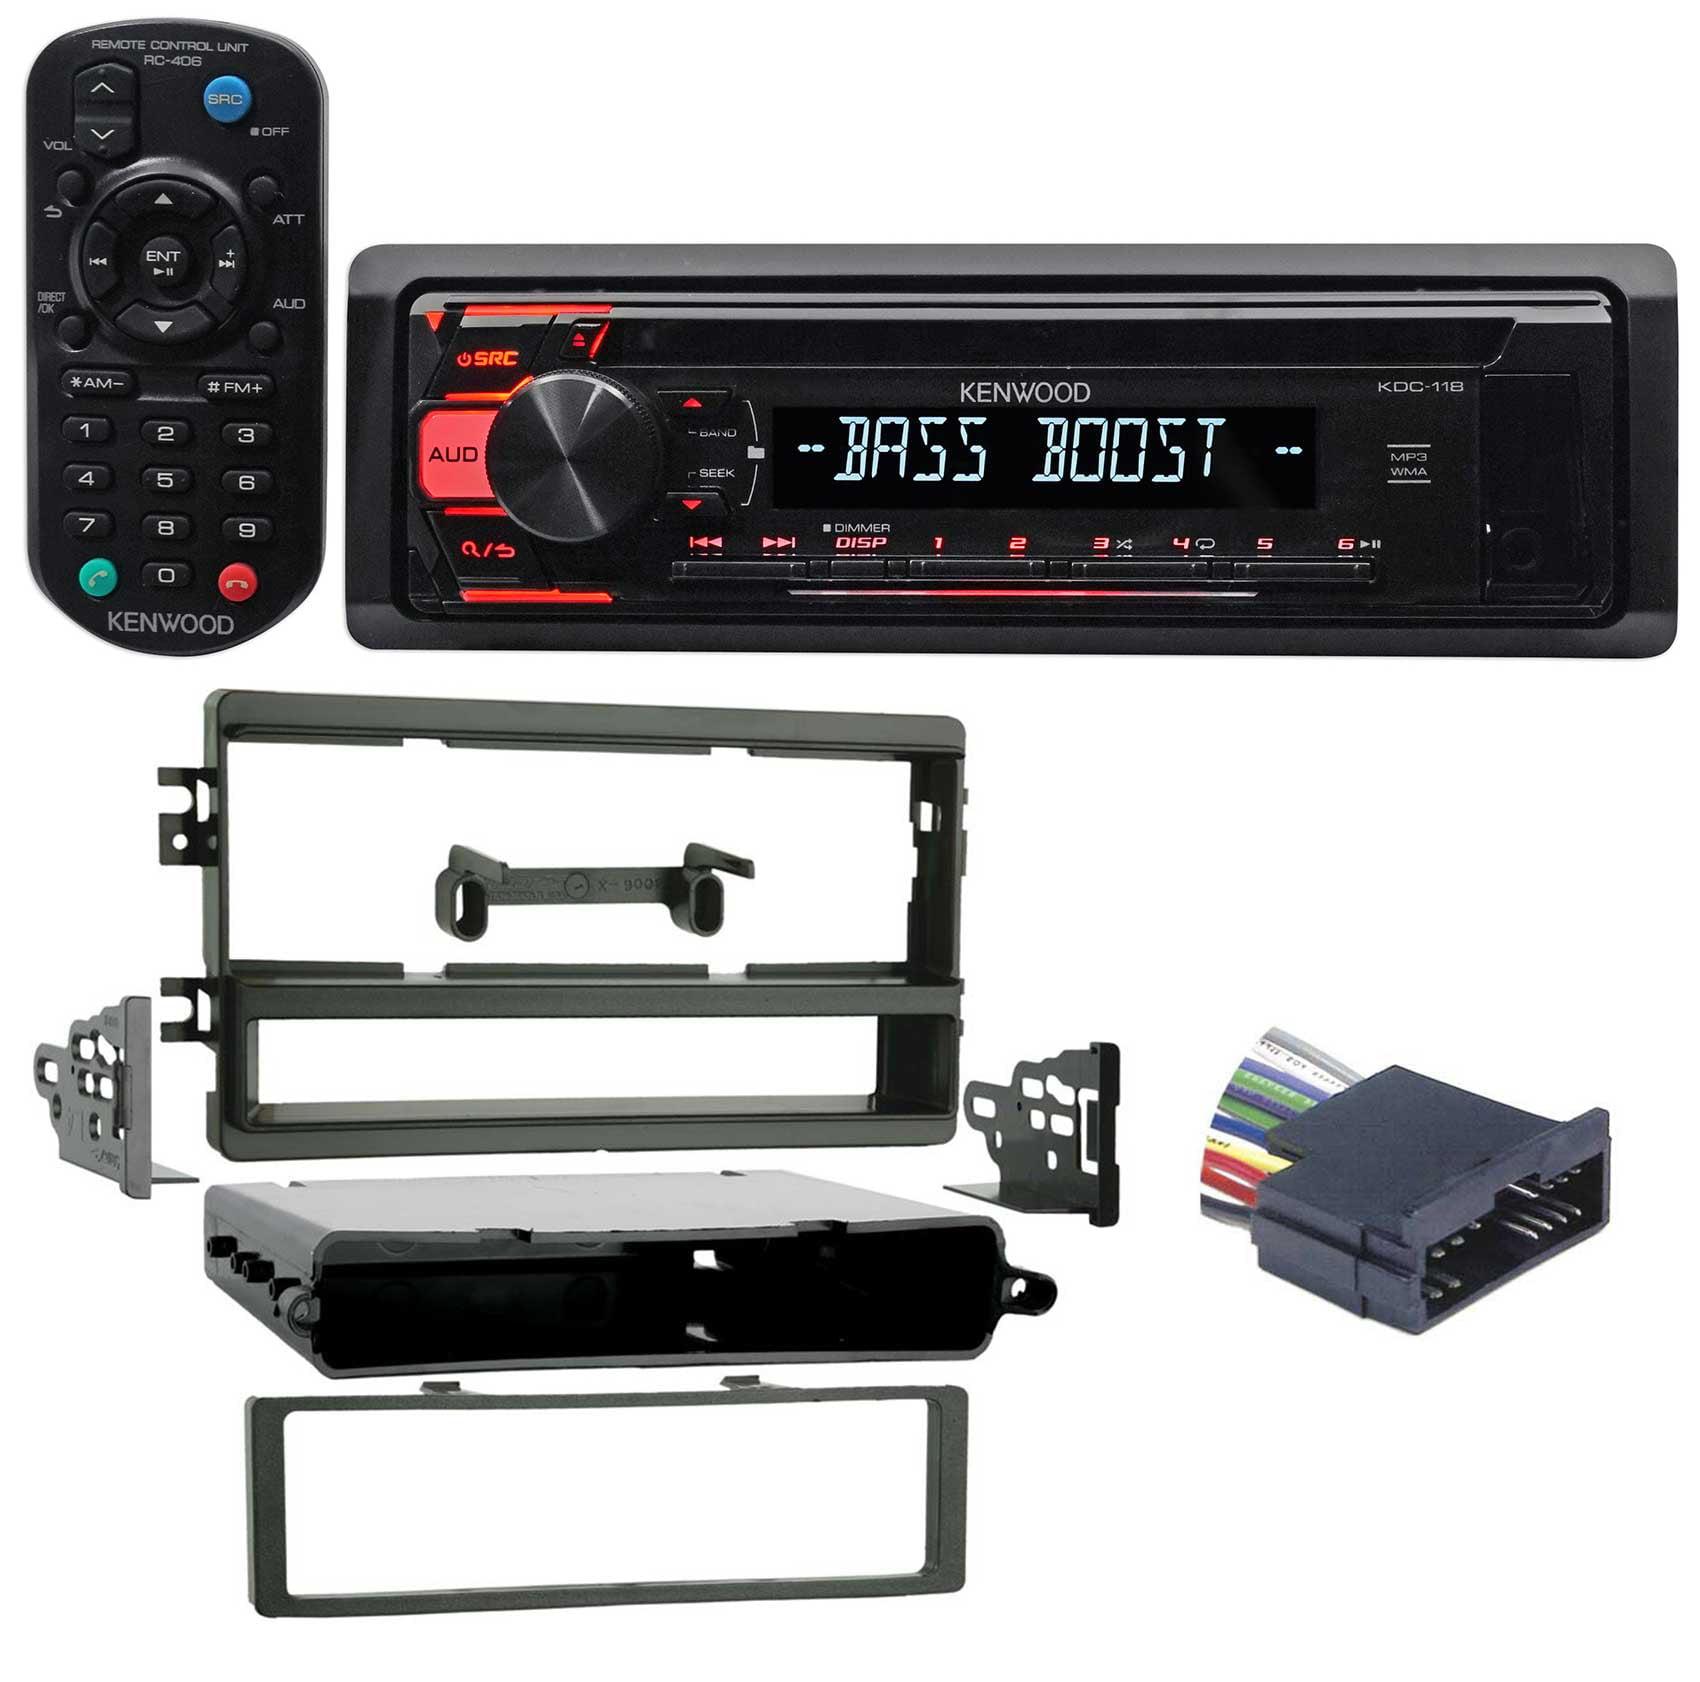 2002 KIA Spectra Kenwood CD Player Stereo Receiver w  Aux Mp3 WMA, Eq + Remote by Kenwood